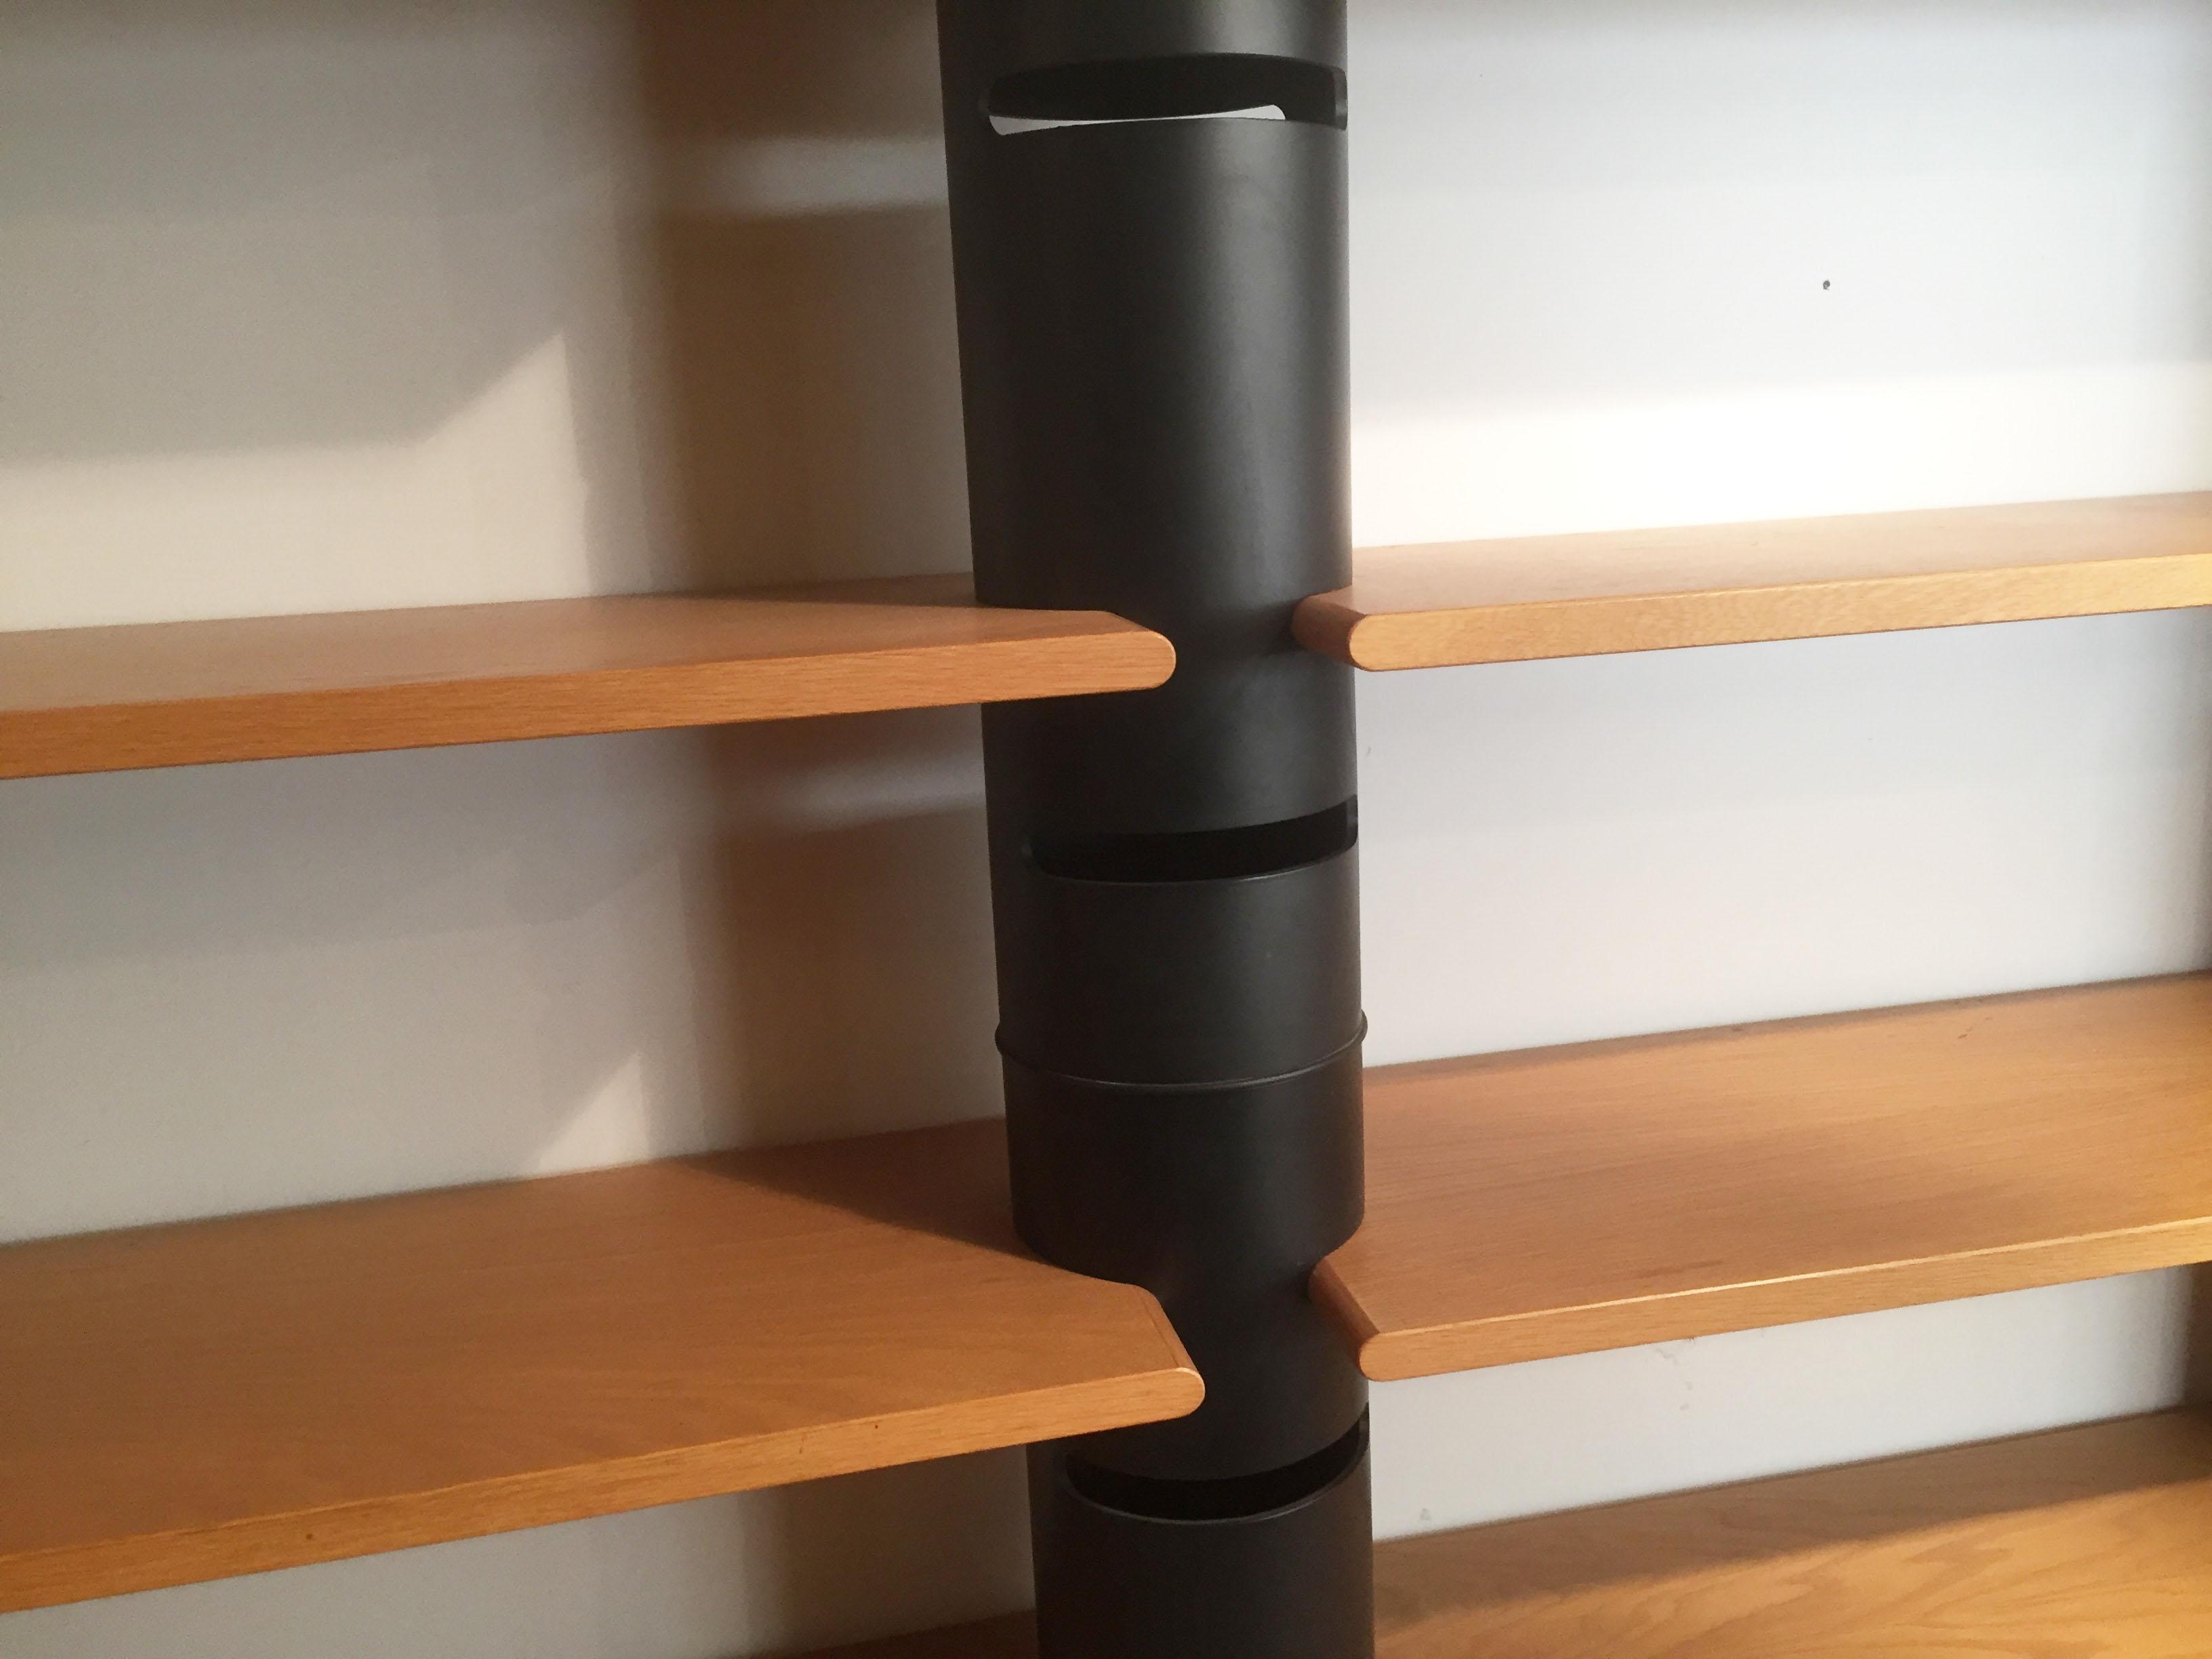 Libreria bernini modernariato design gian franco frattini for Bernini arredamento